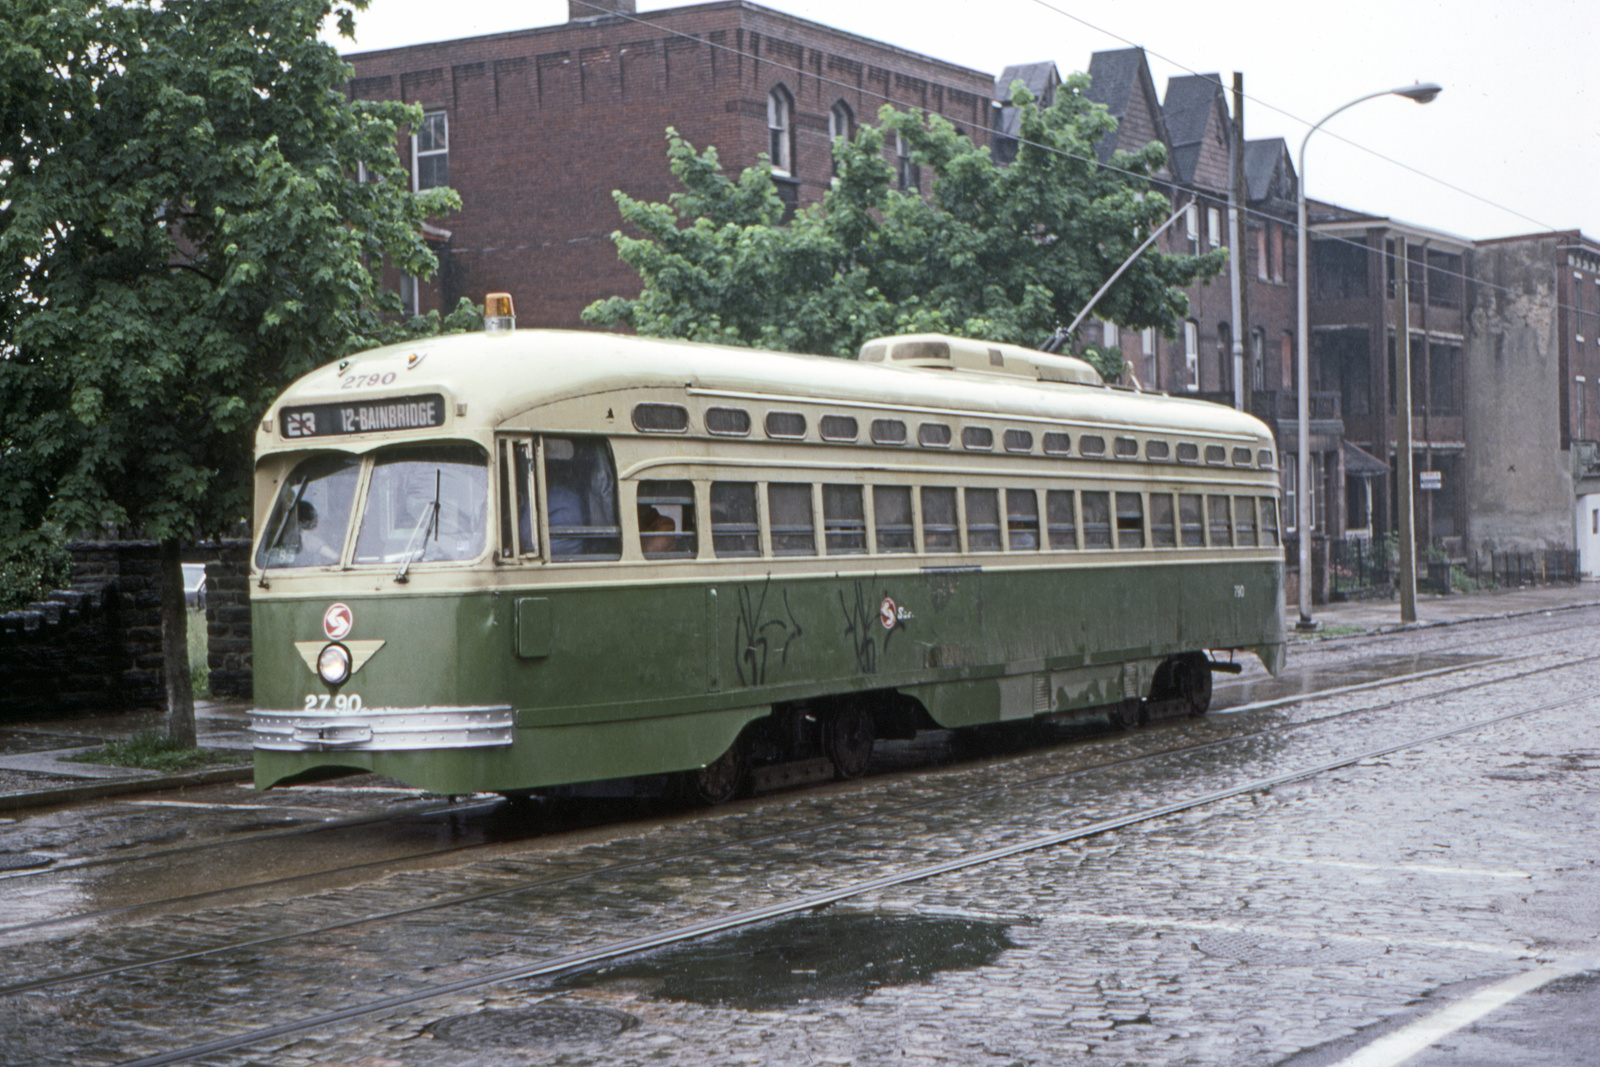 (797k, 1600x1067)<br><b>Country:</b> United States<br><b>City:</b> Philadelphia, PA<br><b>System:</b> SEPTA (or Predecessor)<br><b>Line:</b> Rt. 23-Germantown<br><b>Location:</b> Germantown/Logan<br><b>Car:</b> PTC/SEPTA Postwar All-electric PCC (St.Louis, 1947) 2790 <br><b>Collection of:</b> David Pirmann<br><b>Date:</b> 5/22/1983<br><b>Viewed (this week/total):</b> 2 / 73